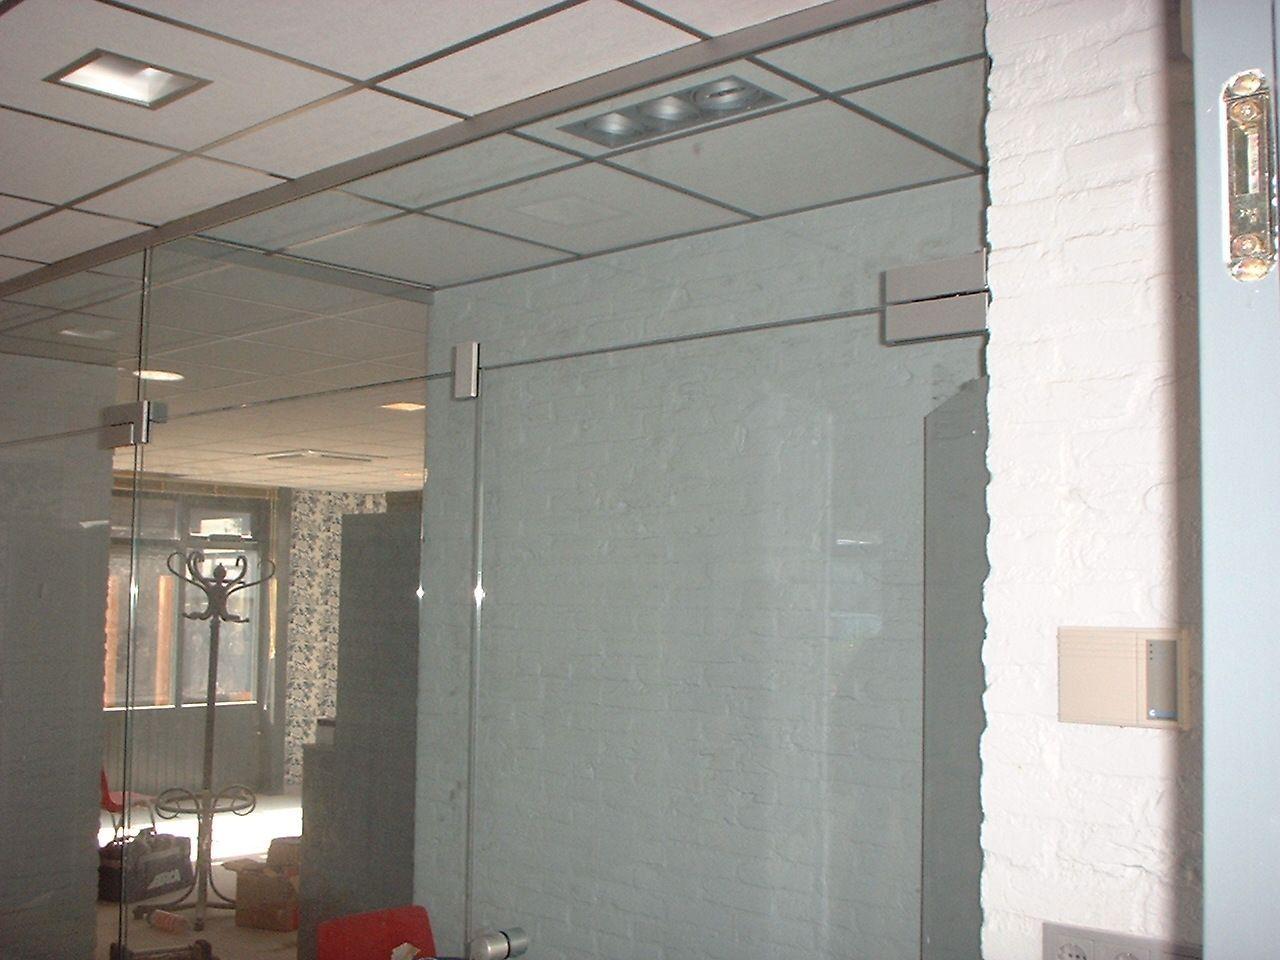 Glazen Wand Woonkamer : Glazen scheidingswand op maat stijlvolle tussenwand alhra glas